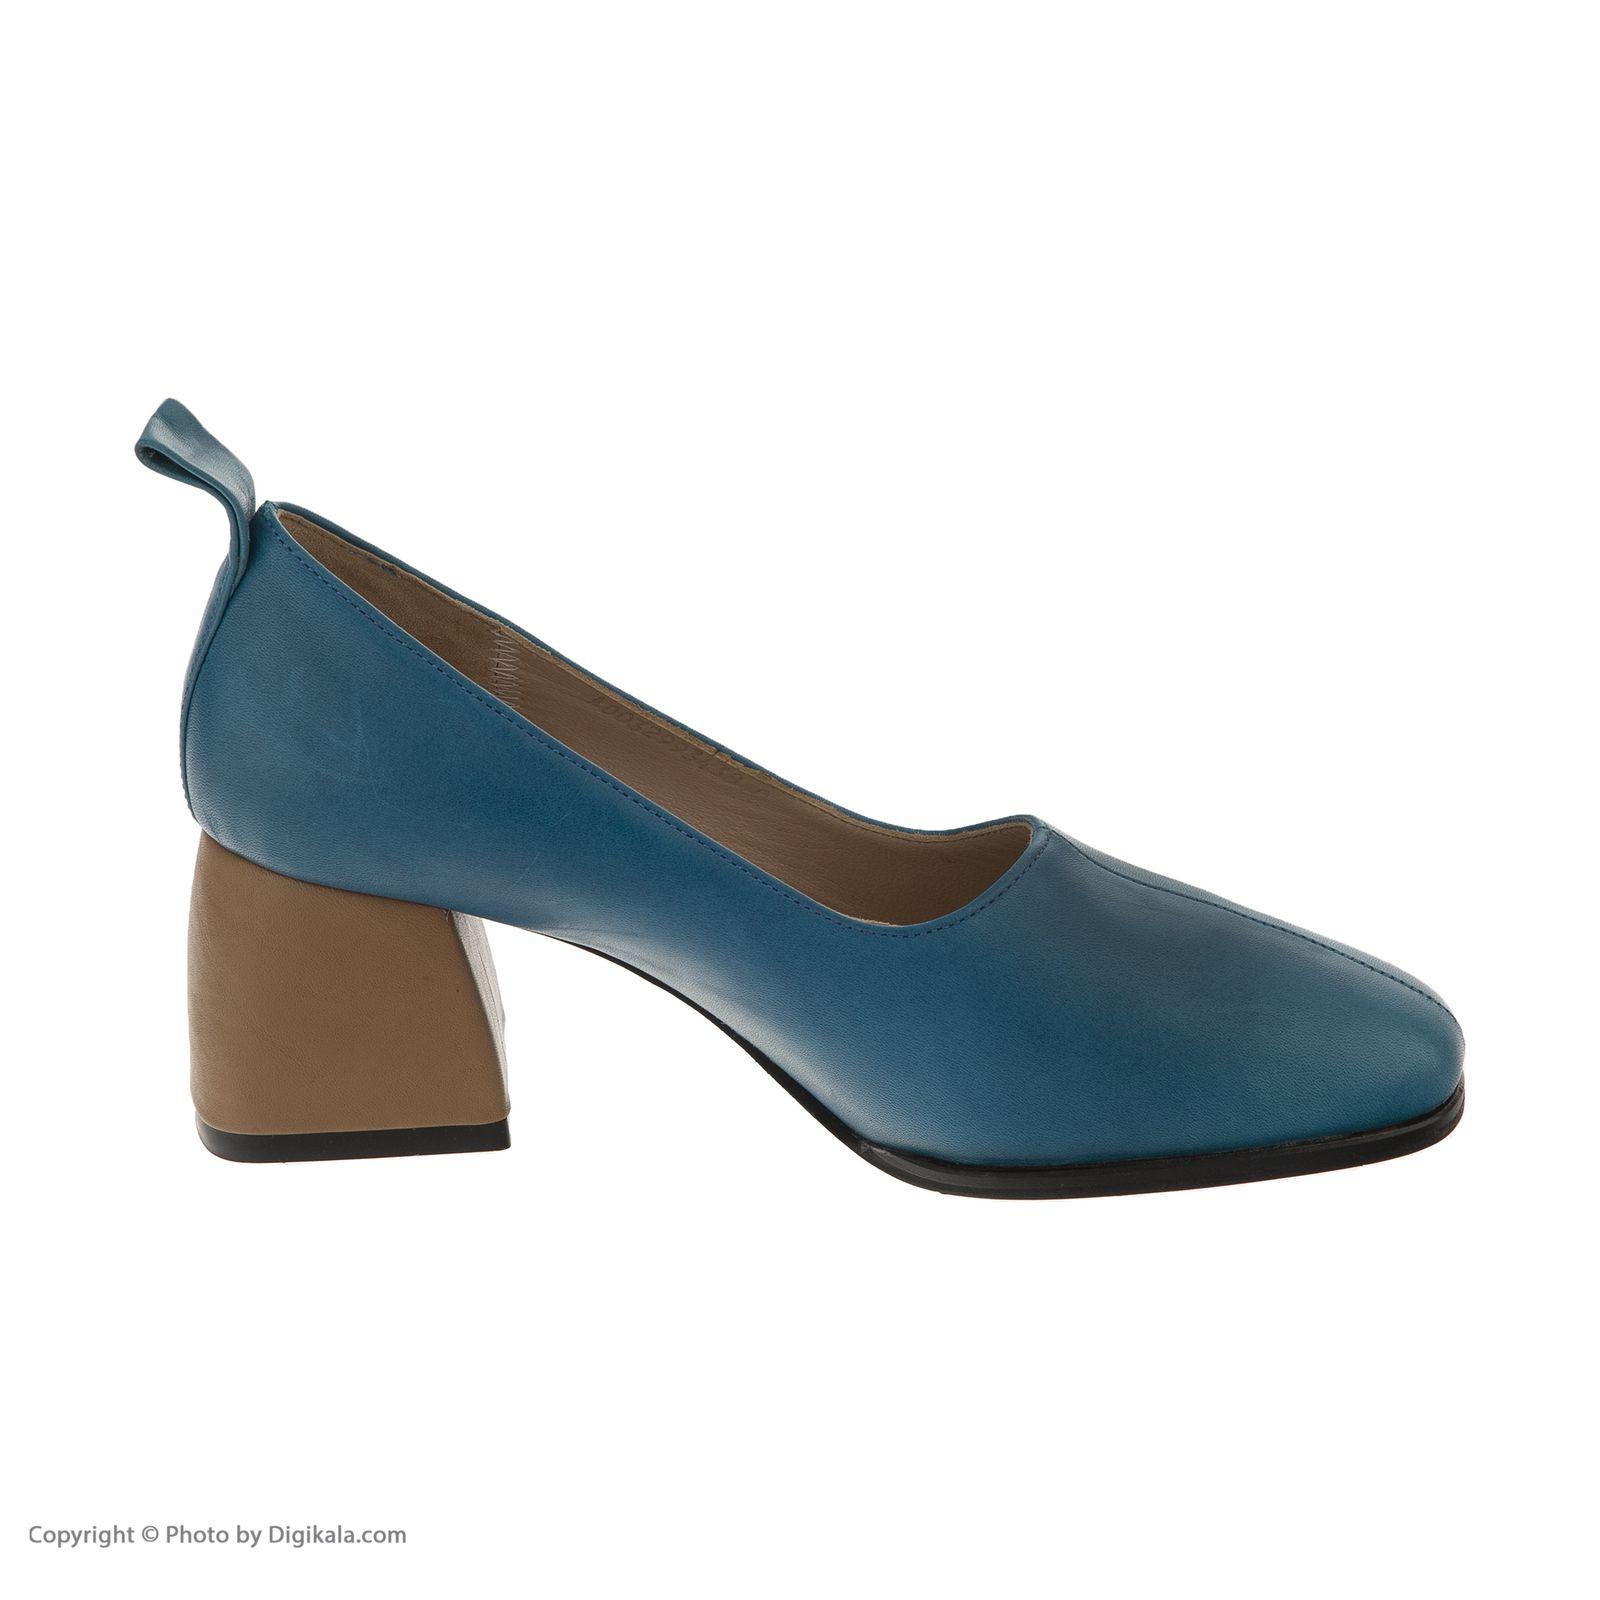 کفش زنانه آرتمن مدل leroy-42694-158 -  - 5